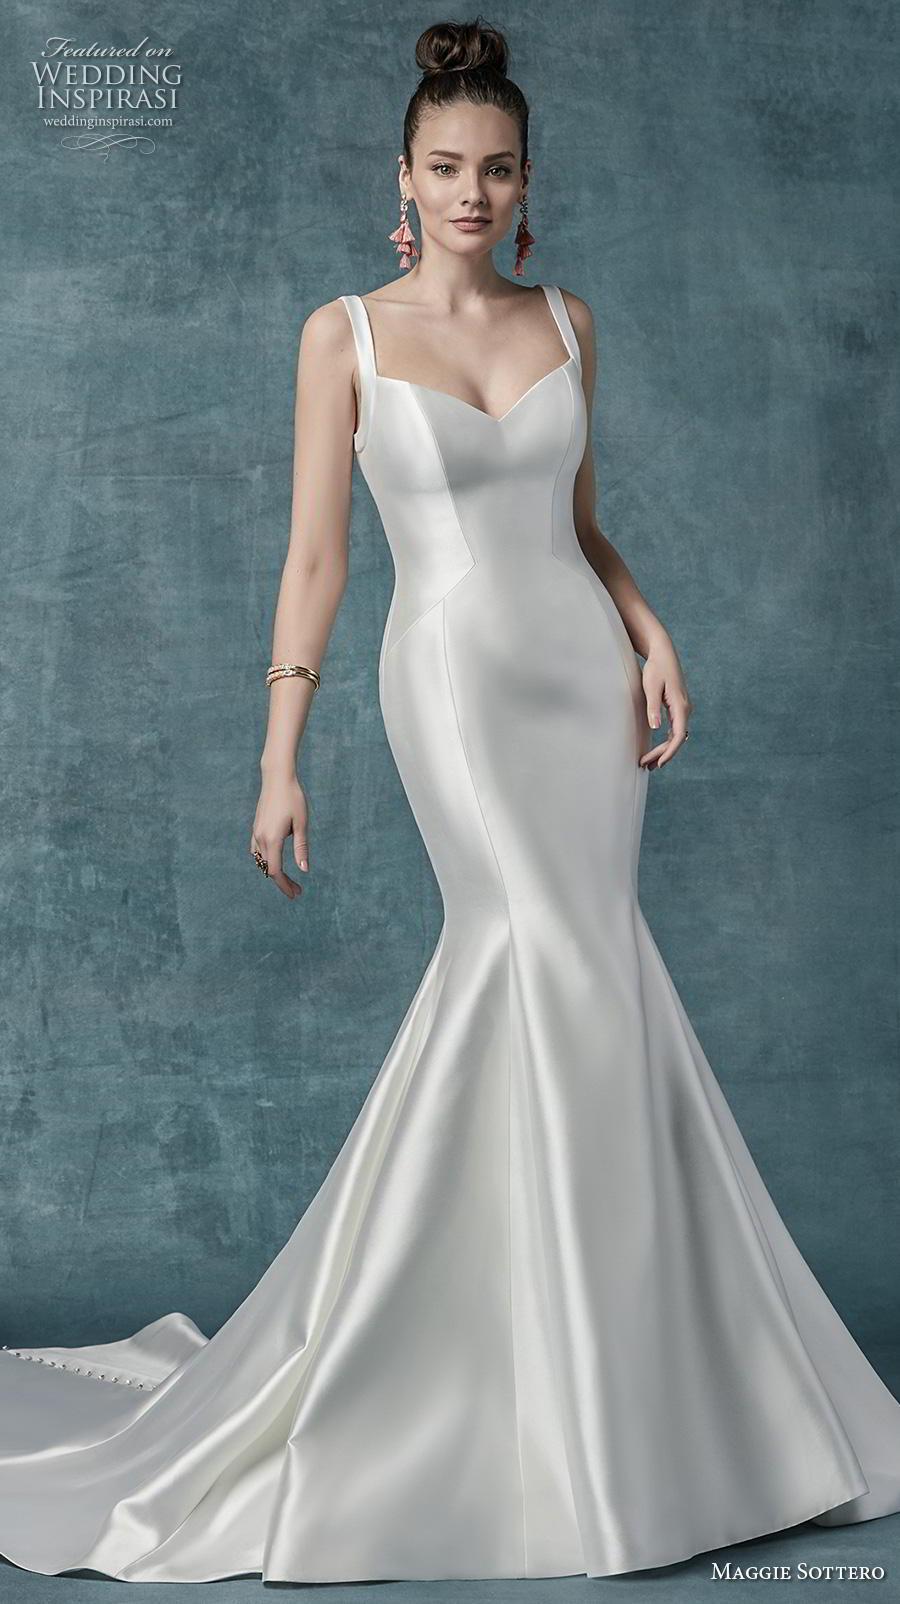 maggie sottero spring 2019 bridal sleeveless with strap diamond neckline simple minimalist satin elegant mermaid wedding dress mid back chapel train (20) mv